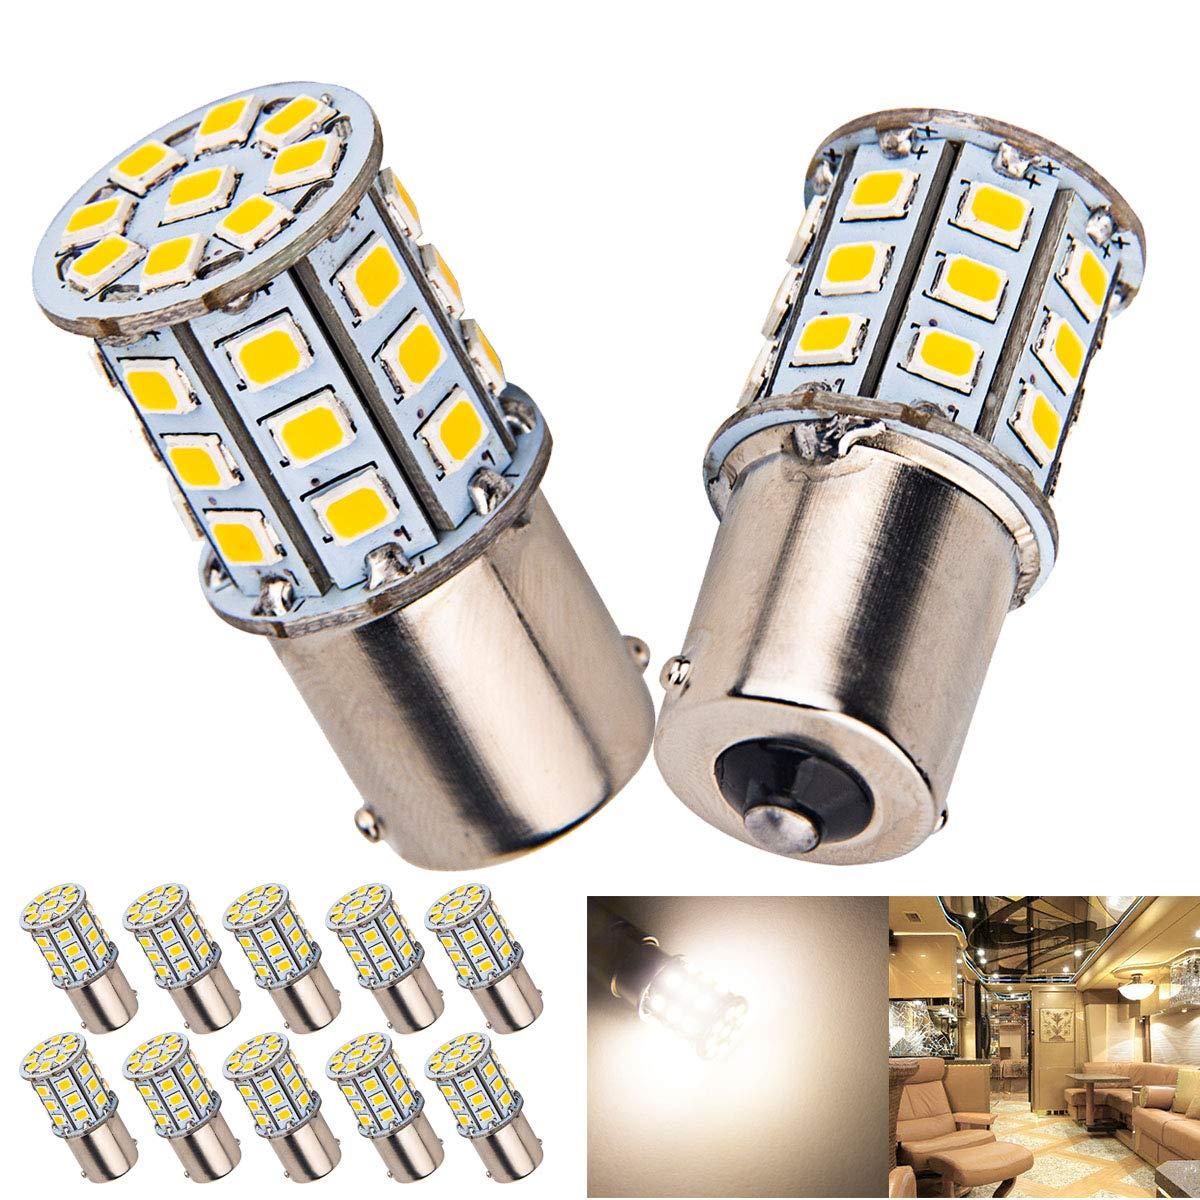 20 x Super Bright 4.2W BA15S 1156 1141 1003 RV Interior White Light LED Bulbs Camper Trailer Turn Signal Backup Reverse,4000K Neutral White